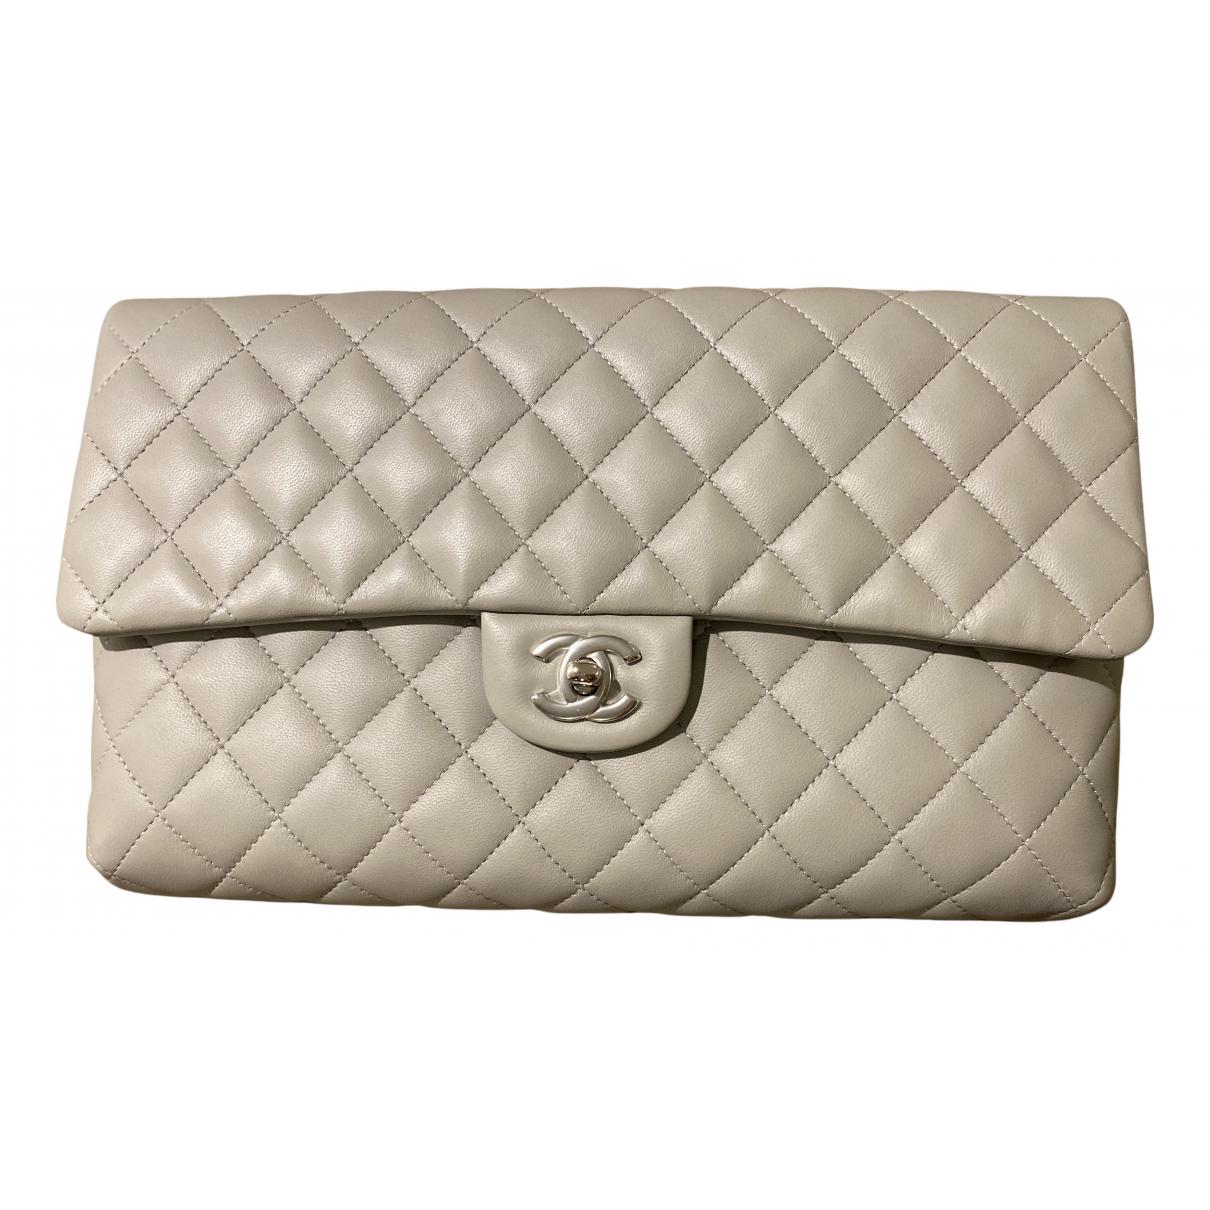 Chanel Timeless/Classique Clutch in  Grau Leder